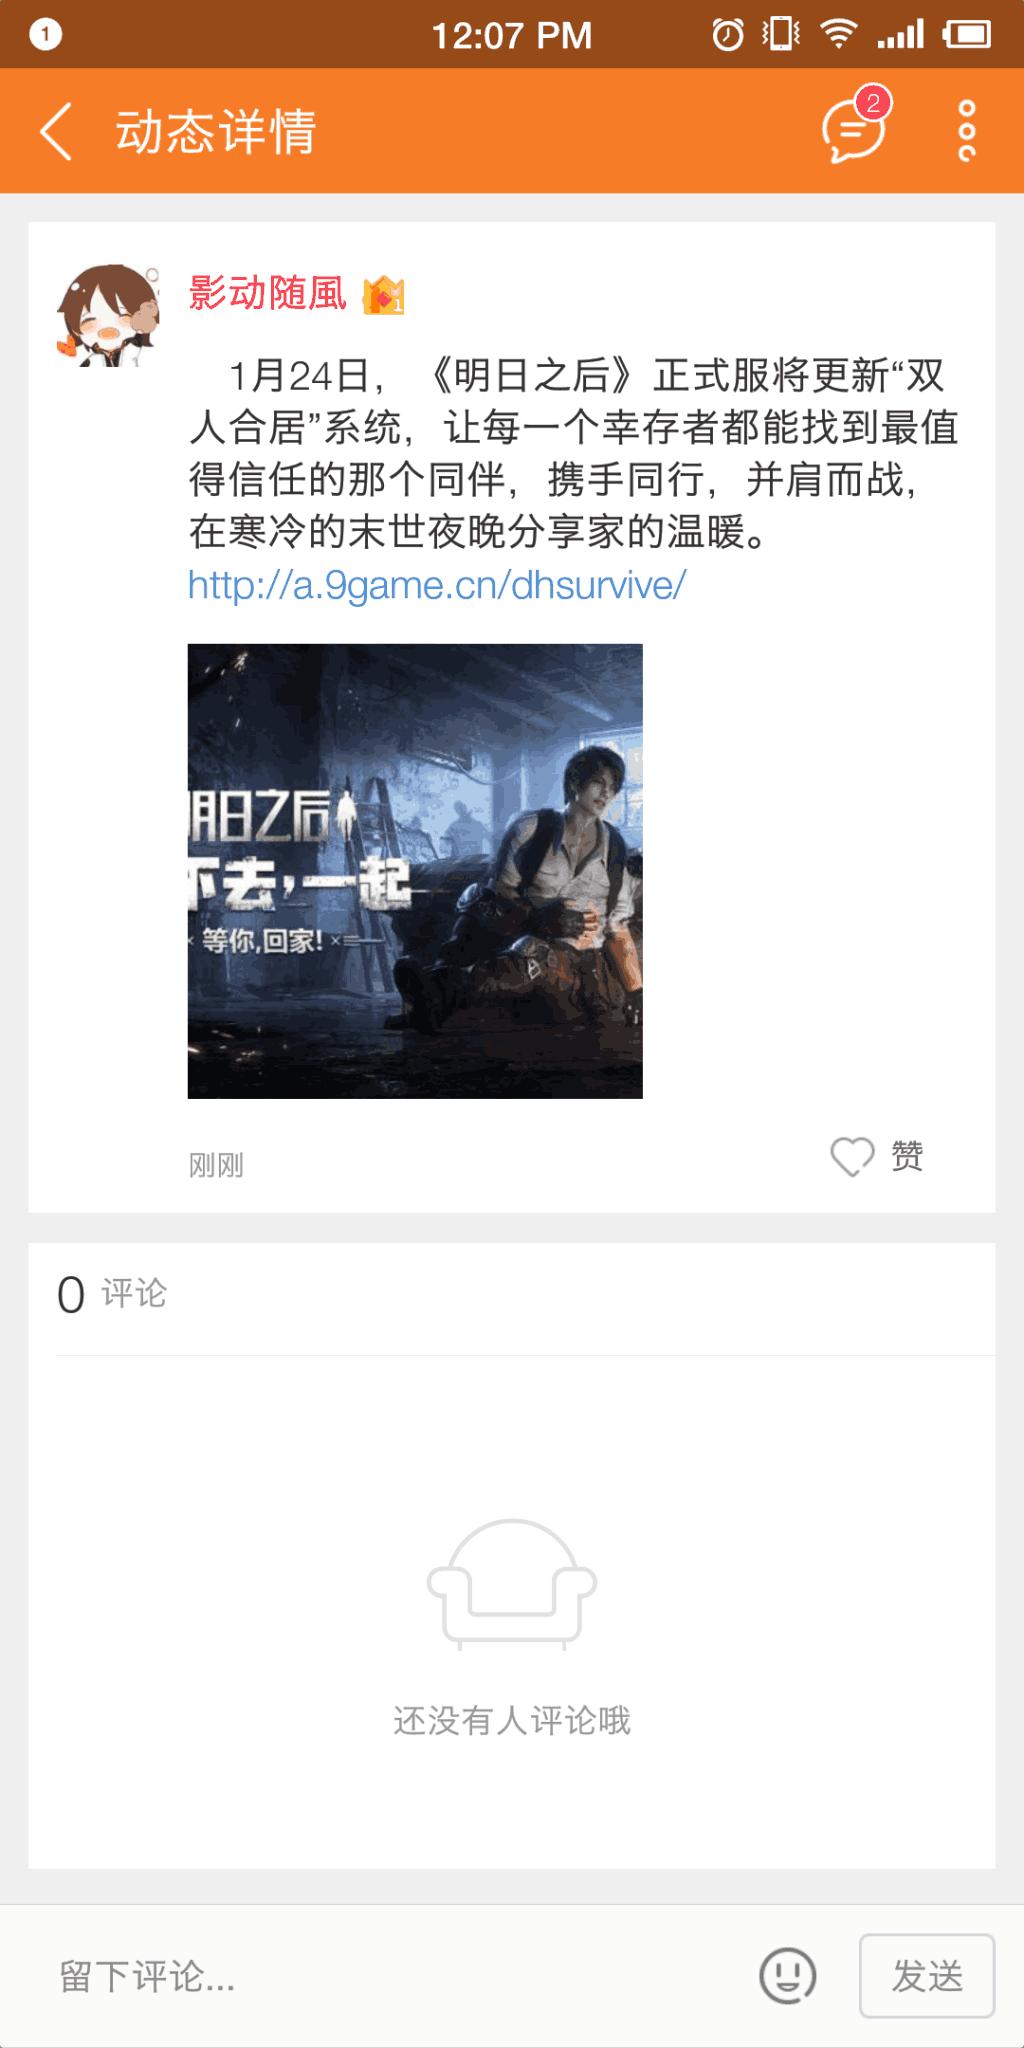 Screenshot_2019s01s18s12s07s42s041_九游.png